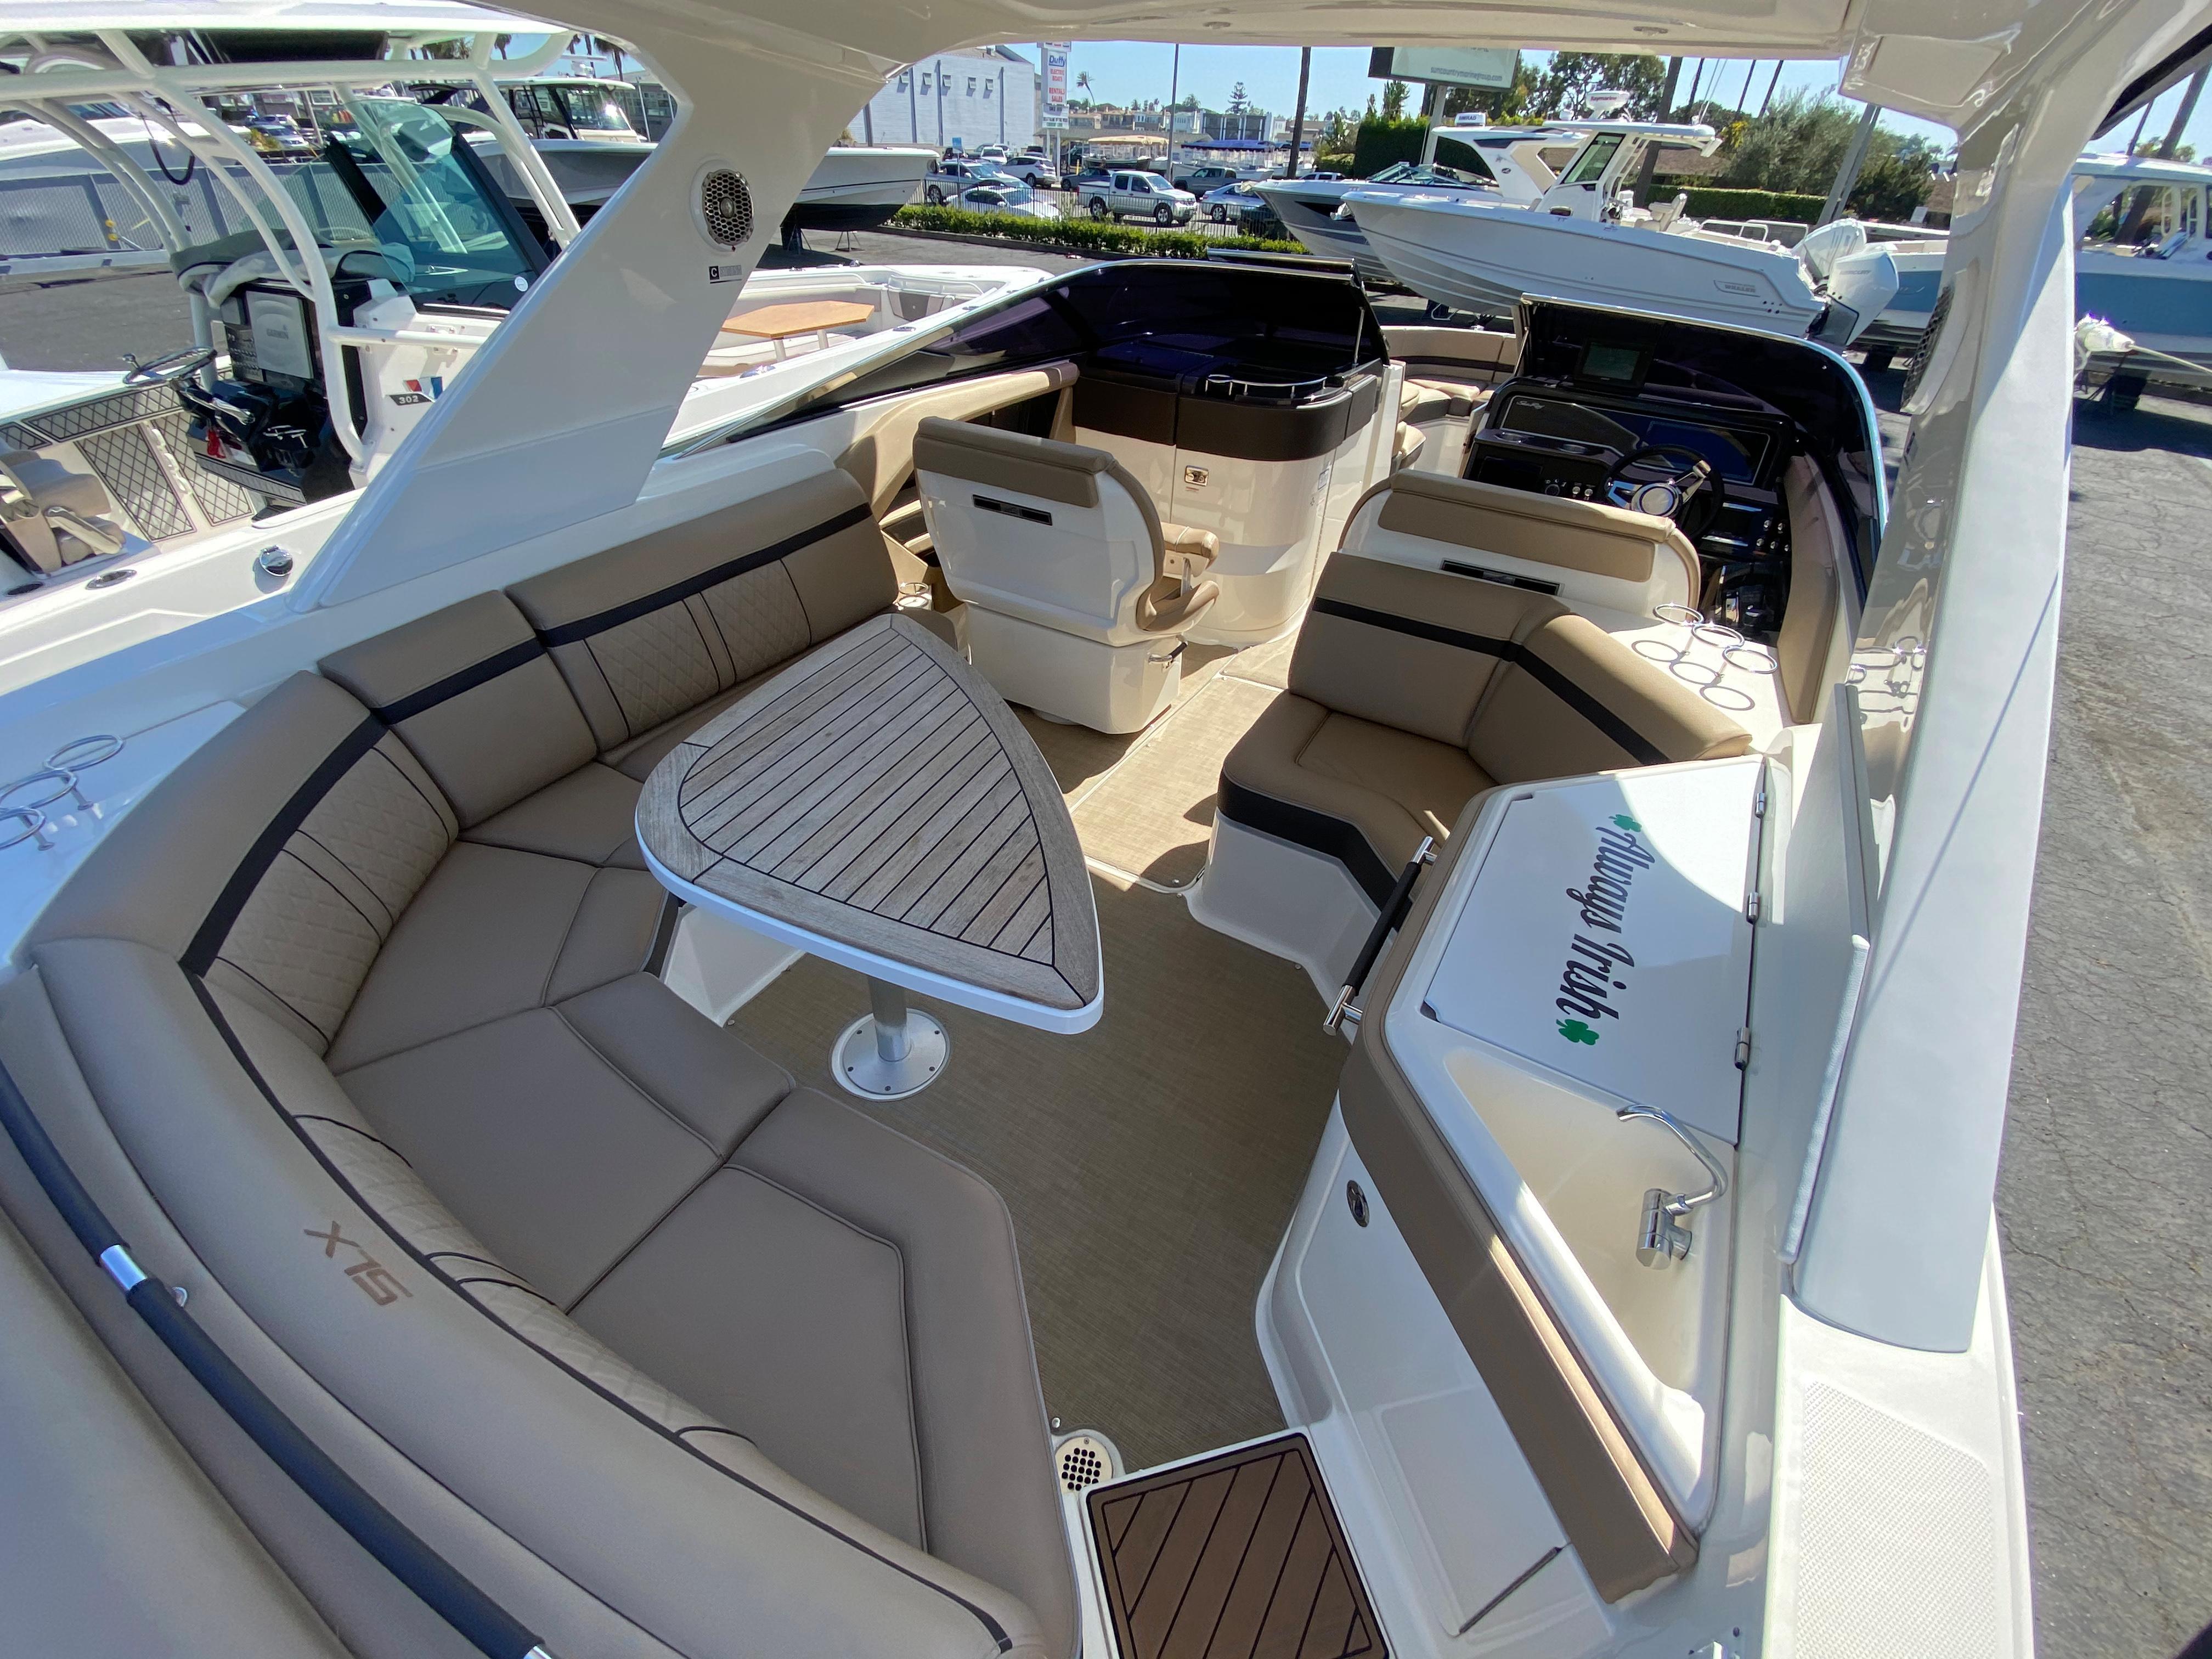 2016 Sea Ray 310 SLX #T3422D inventory image at Sun Country Coastal in Newport Beach